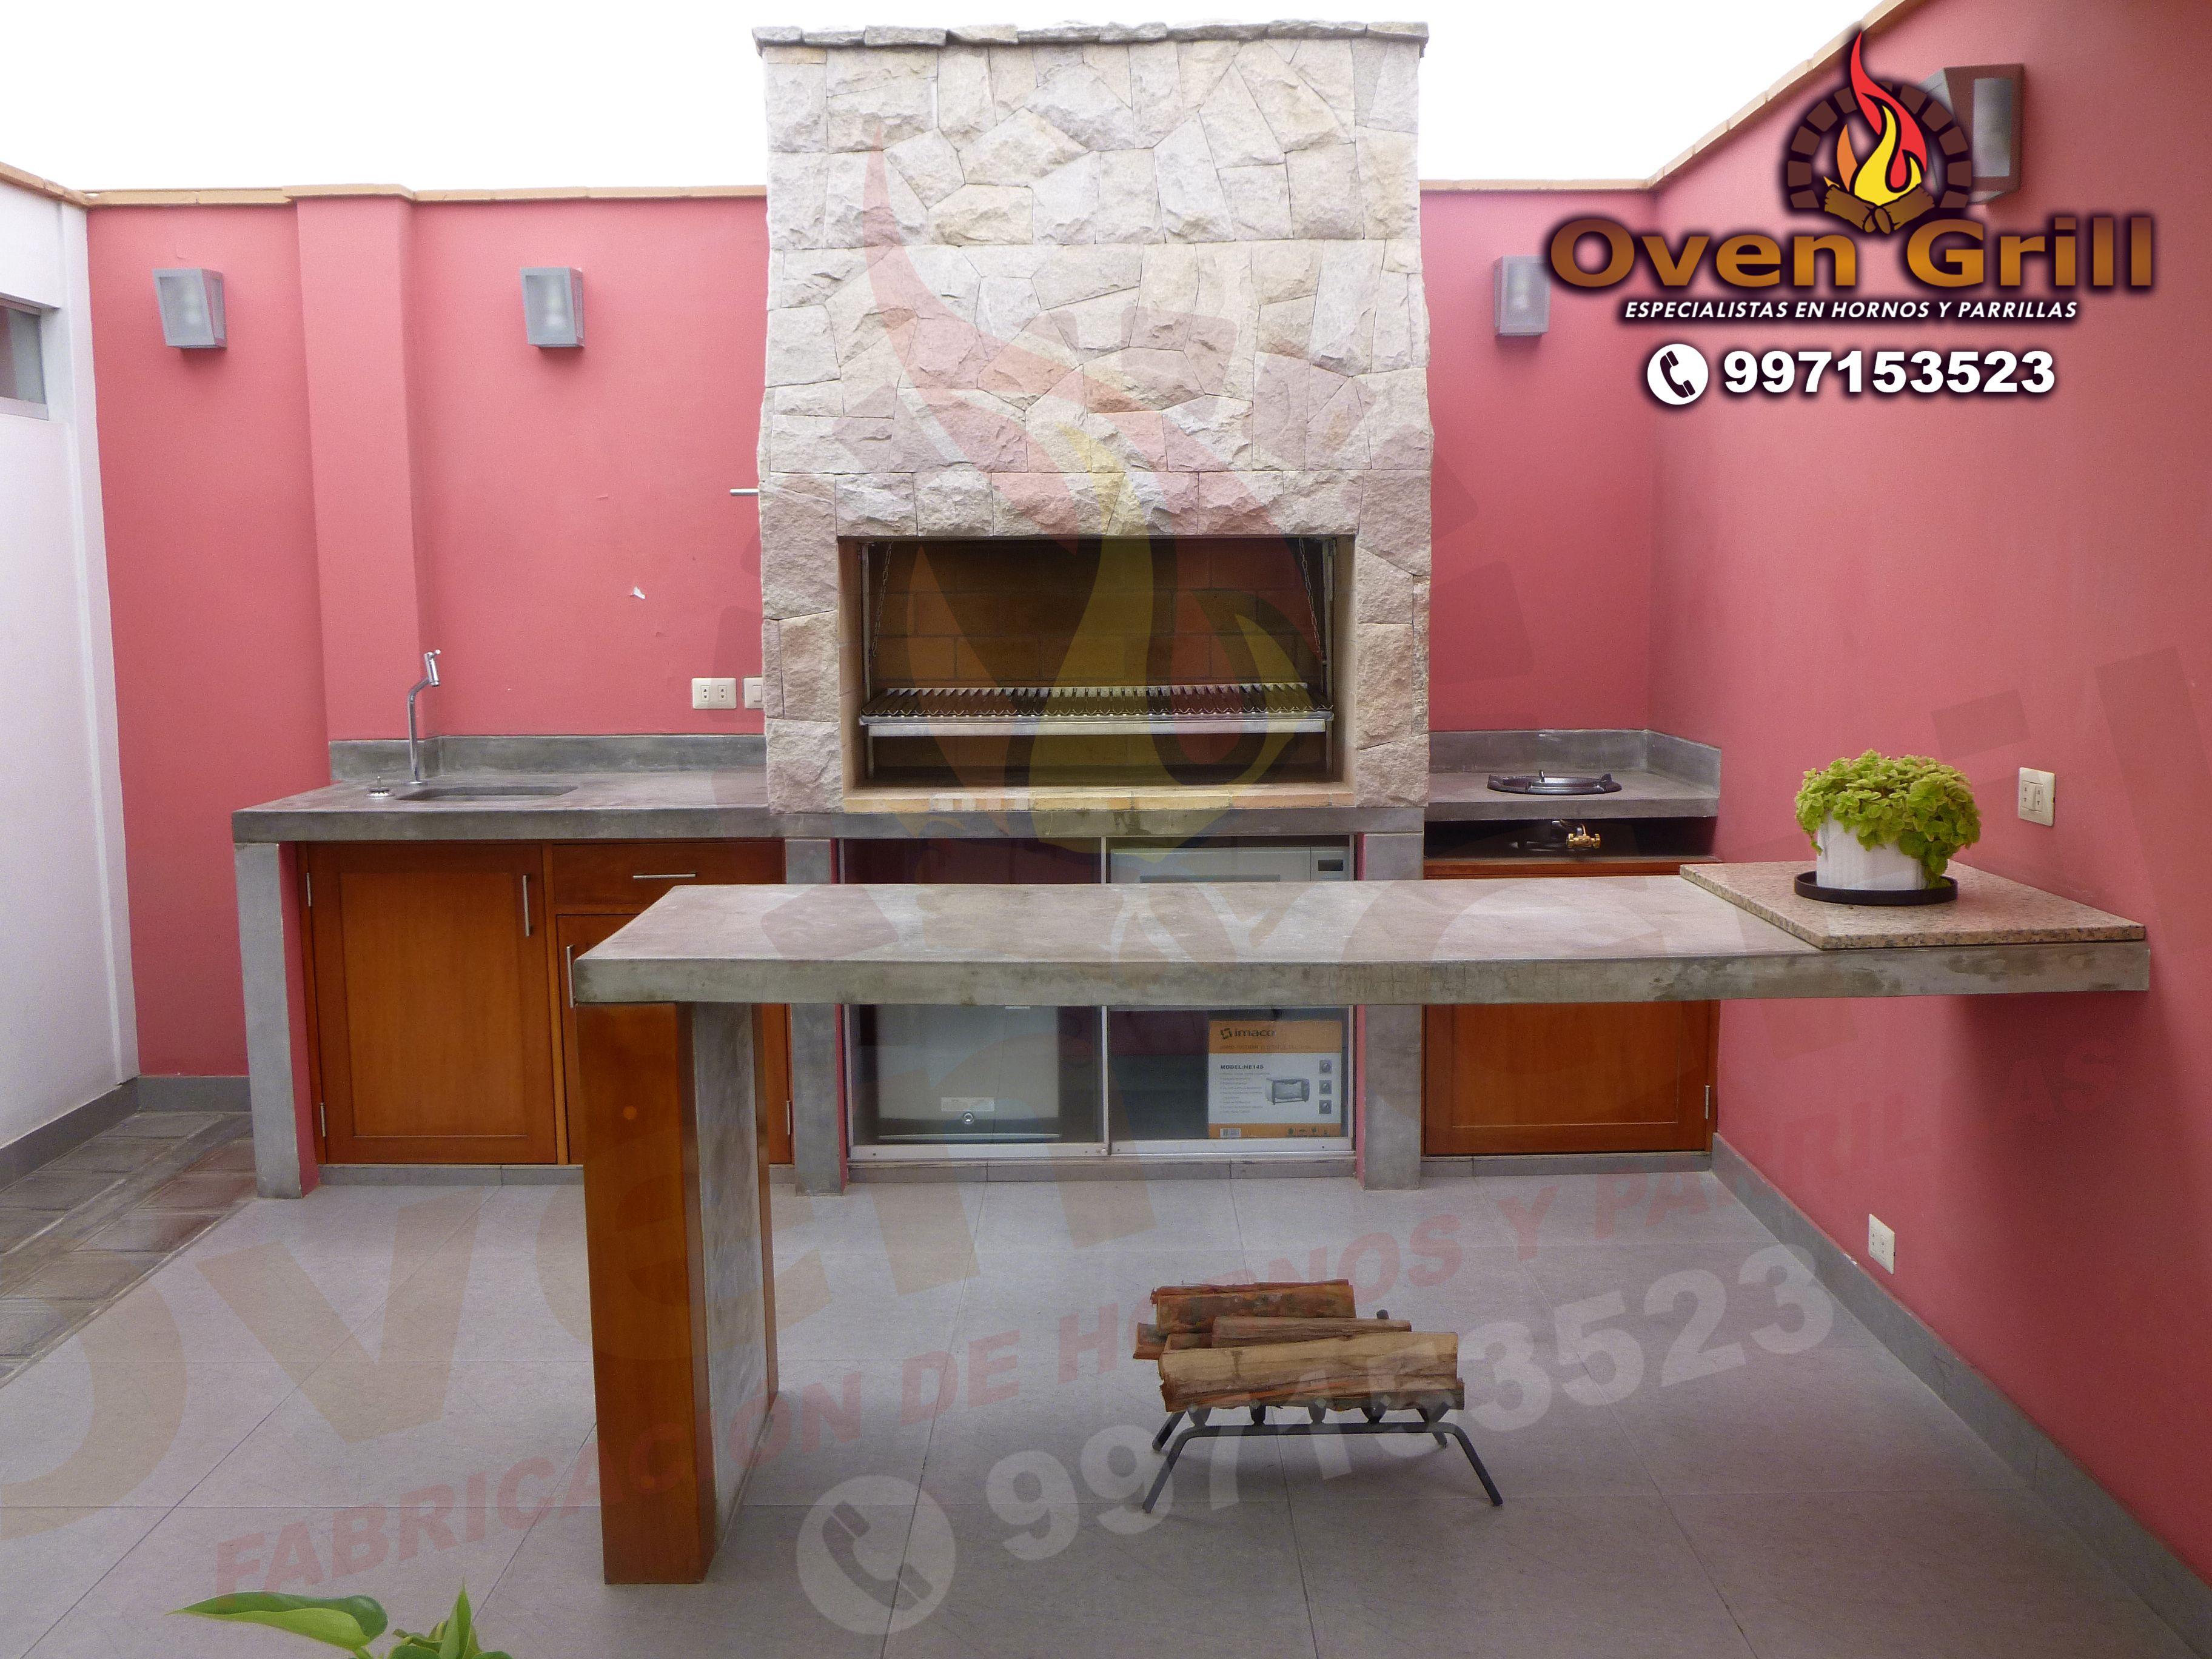 asador de piedra moderno oven grill cel 997153523